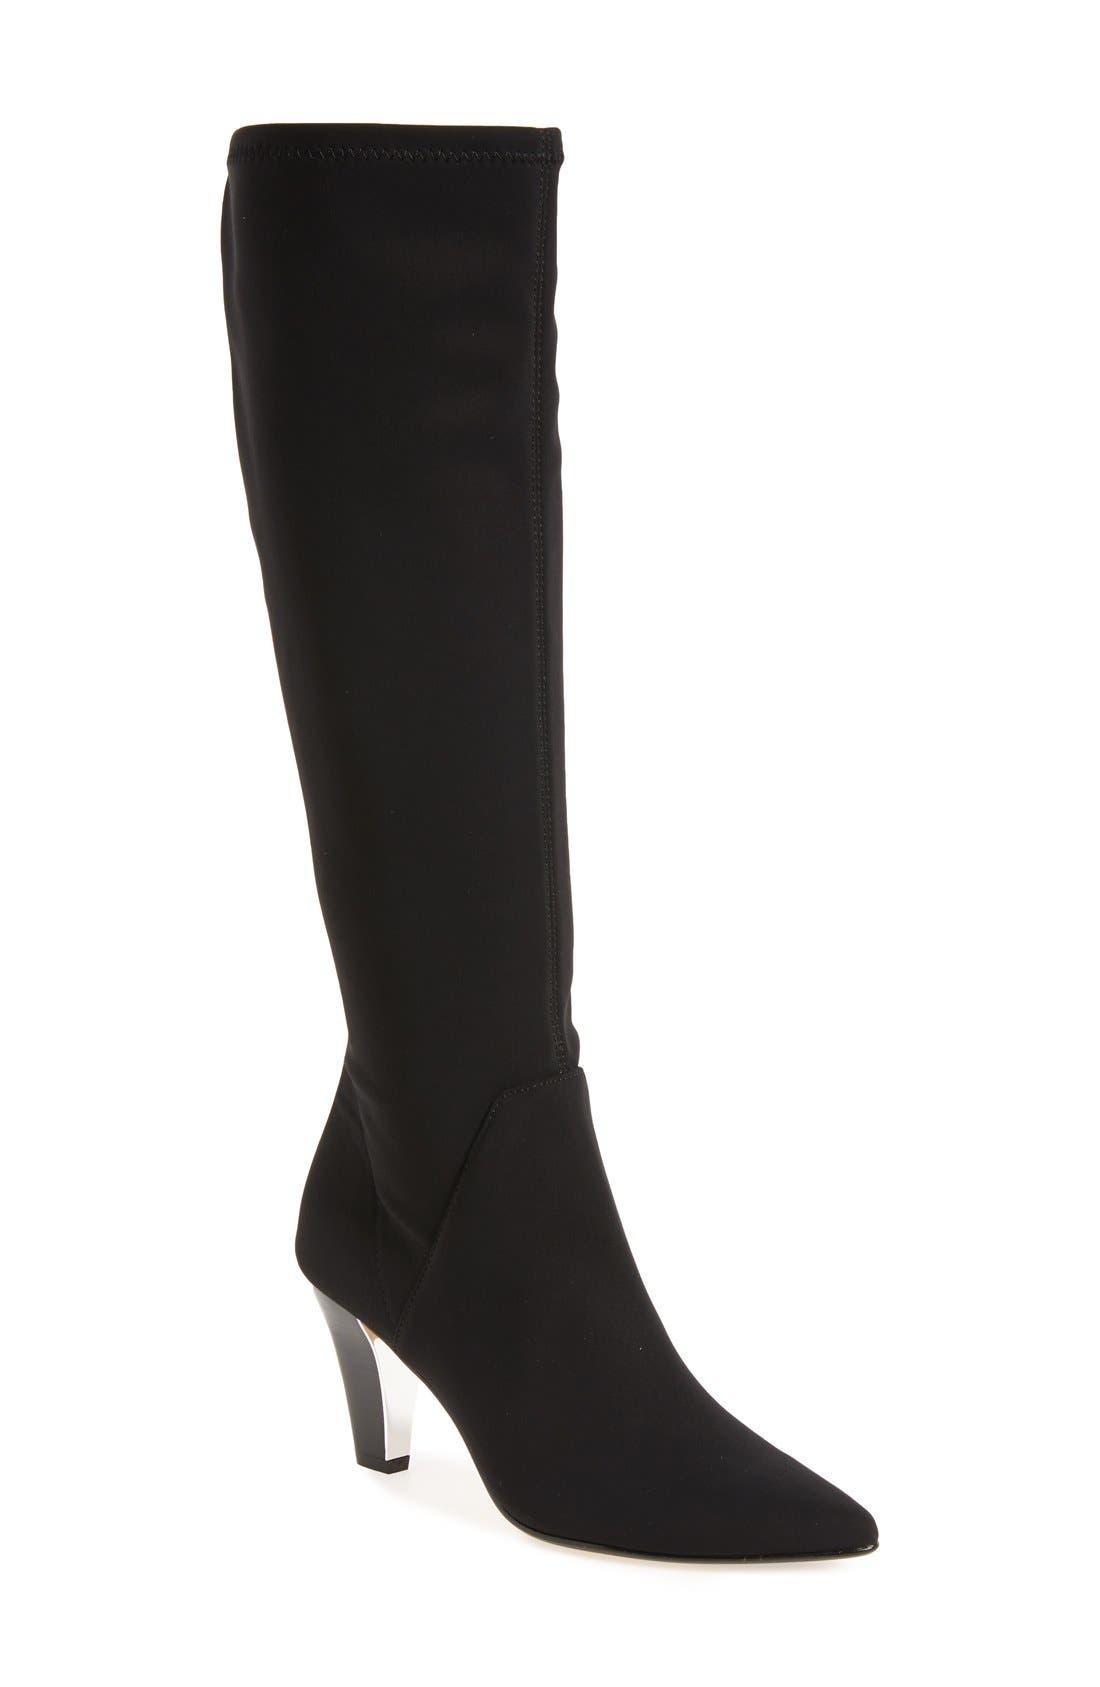 Alternate Image 1 Selected - Donald J Pliner 'Tessa' Knee High Boot (Women)